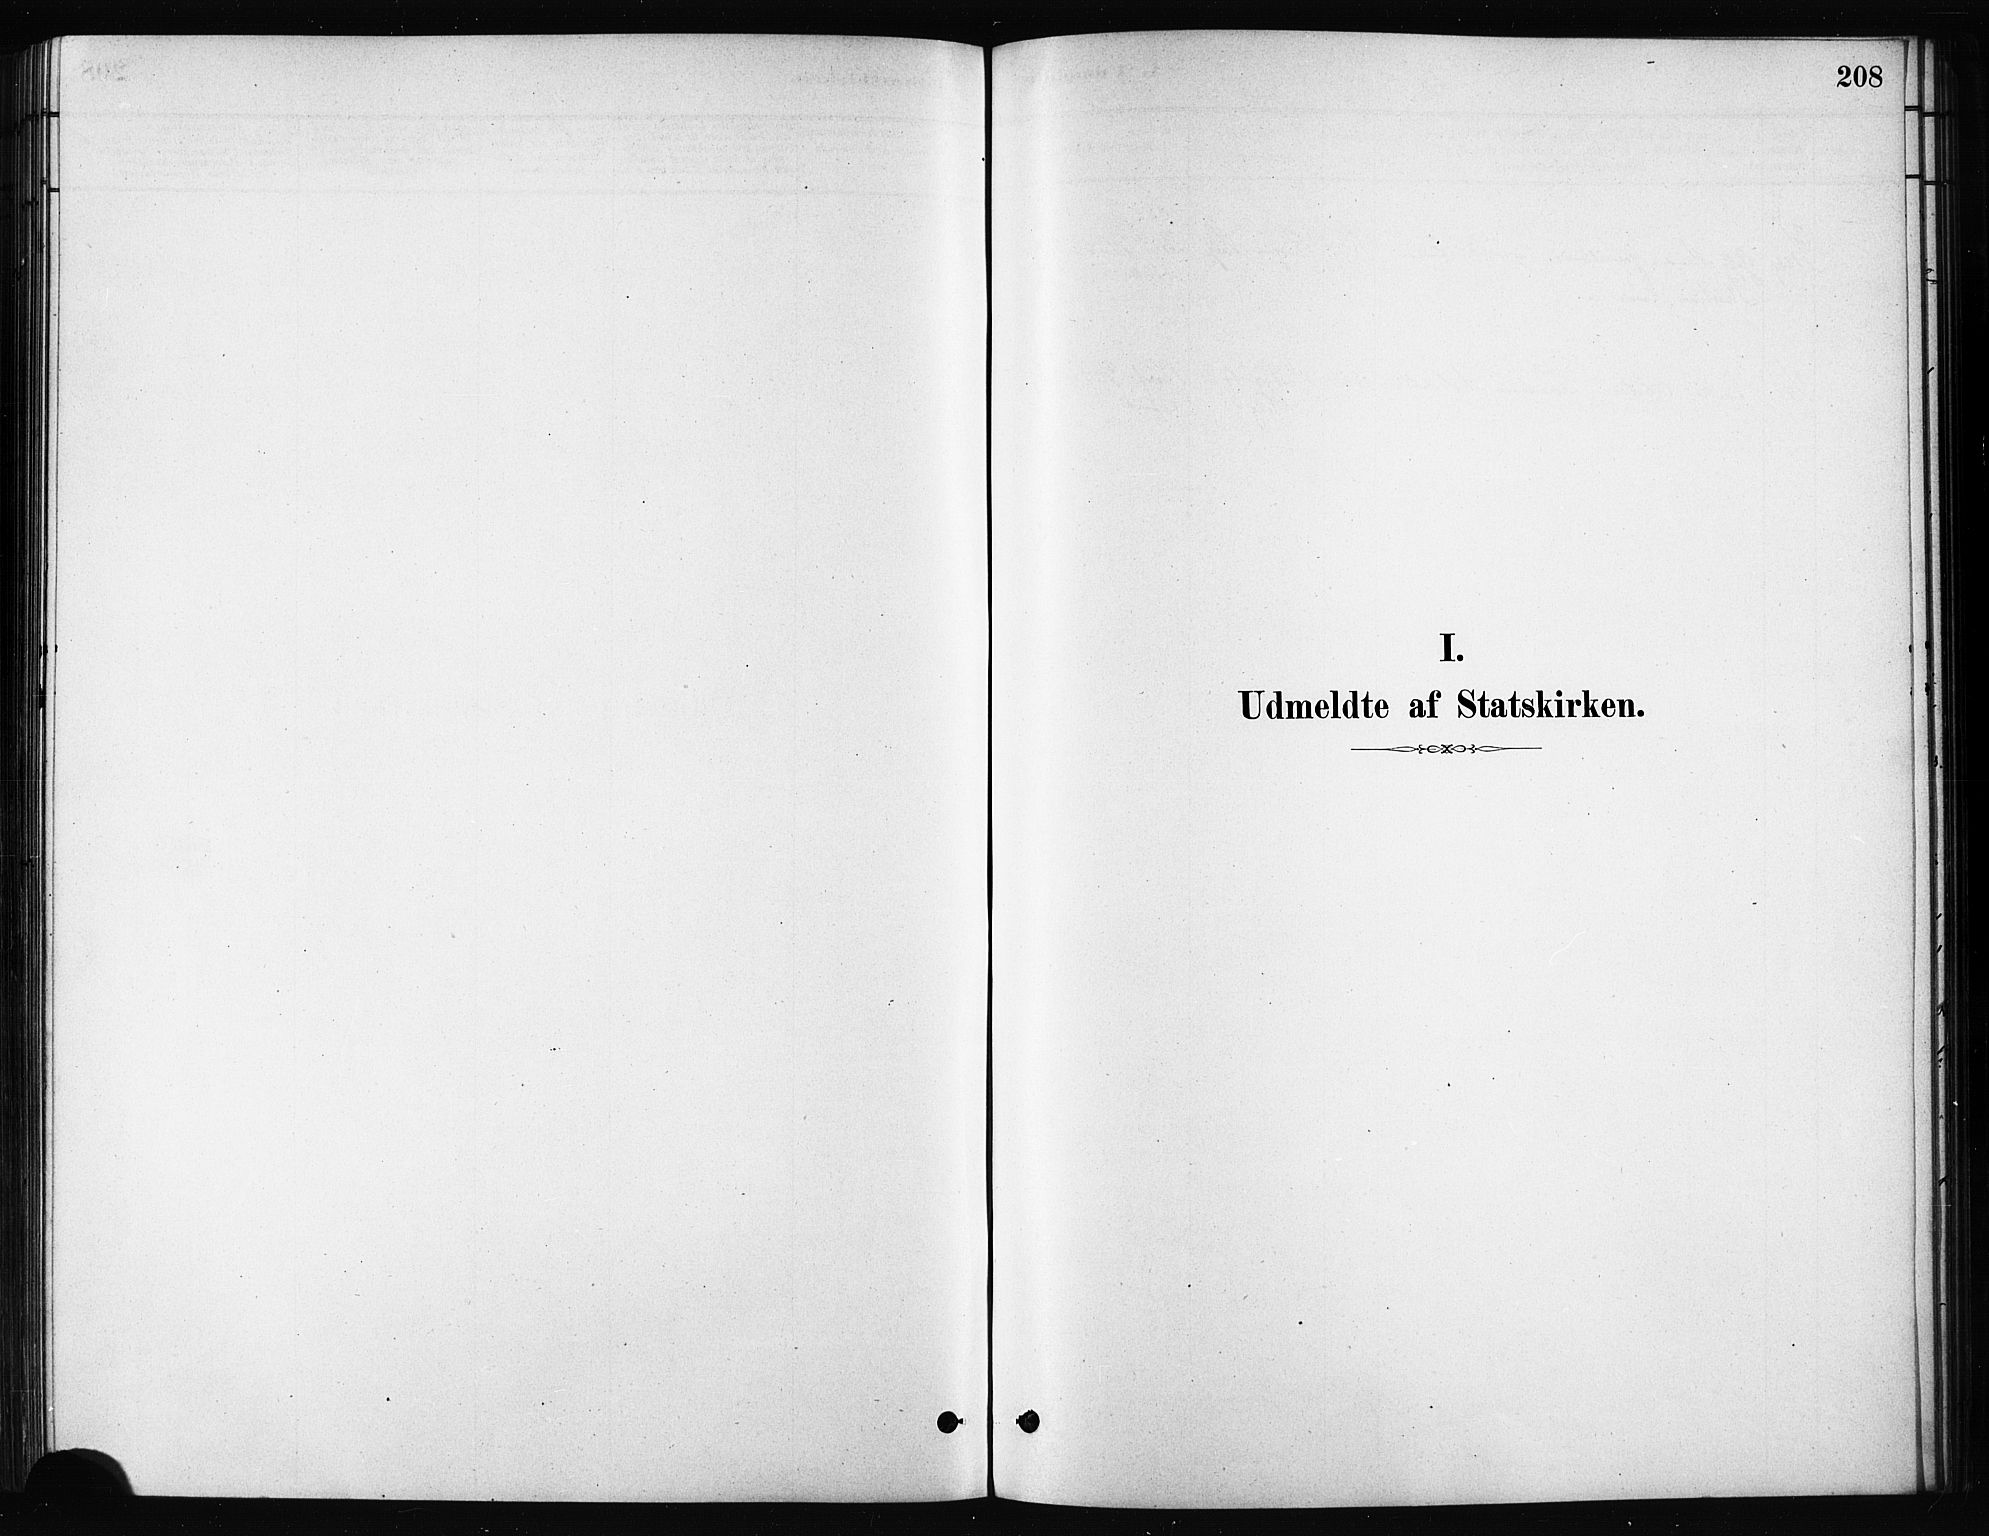 SATØ, Karlsøy sokneprestembete, H/Ha/Haa/L0011kirke: Ministerialbok nr. 11, 1879-1892, s. 208